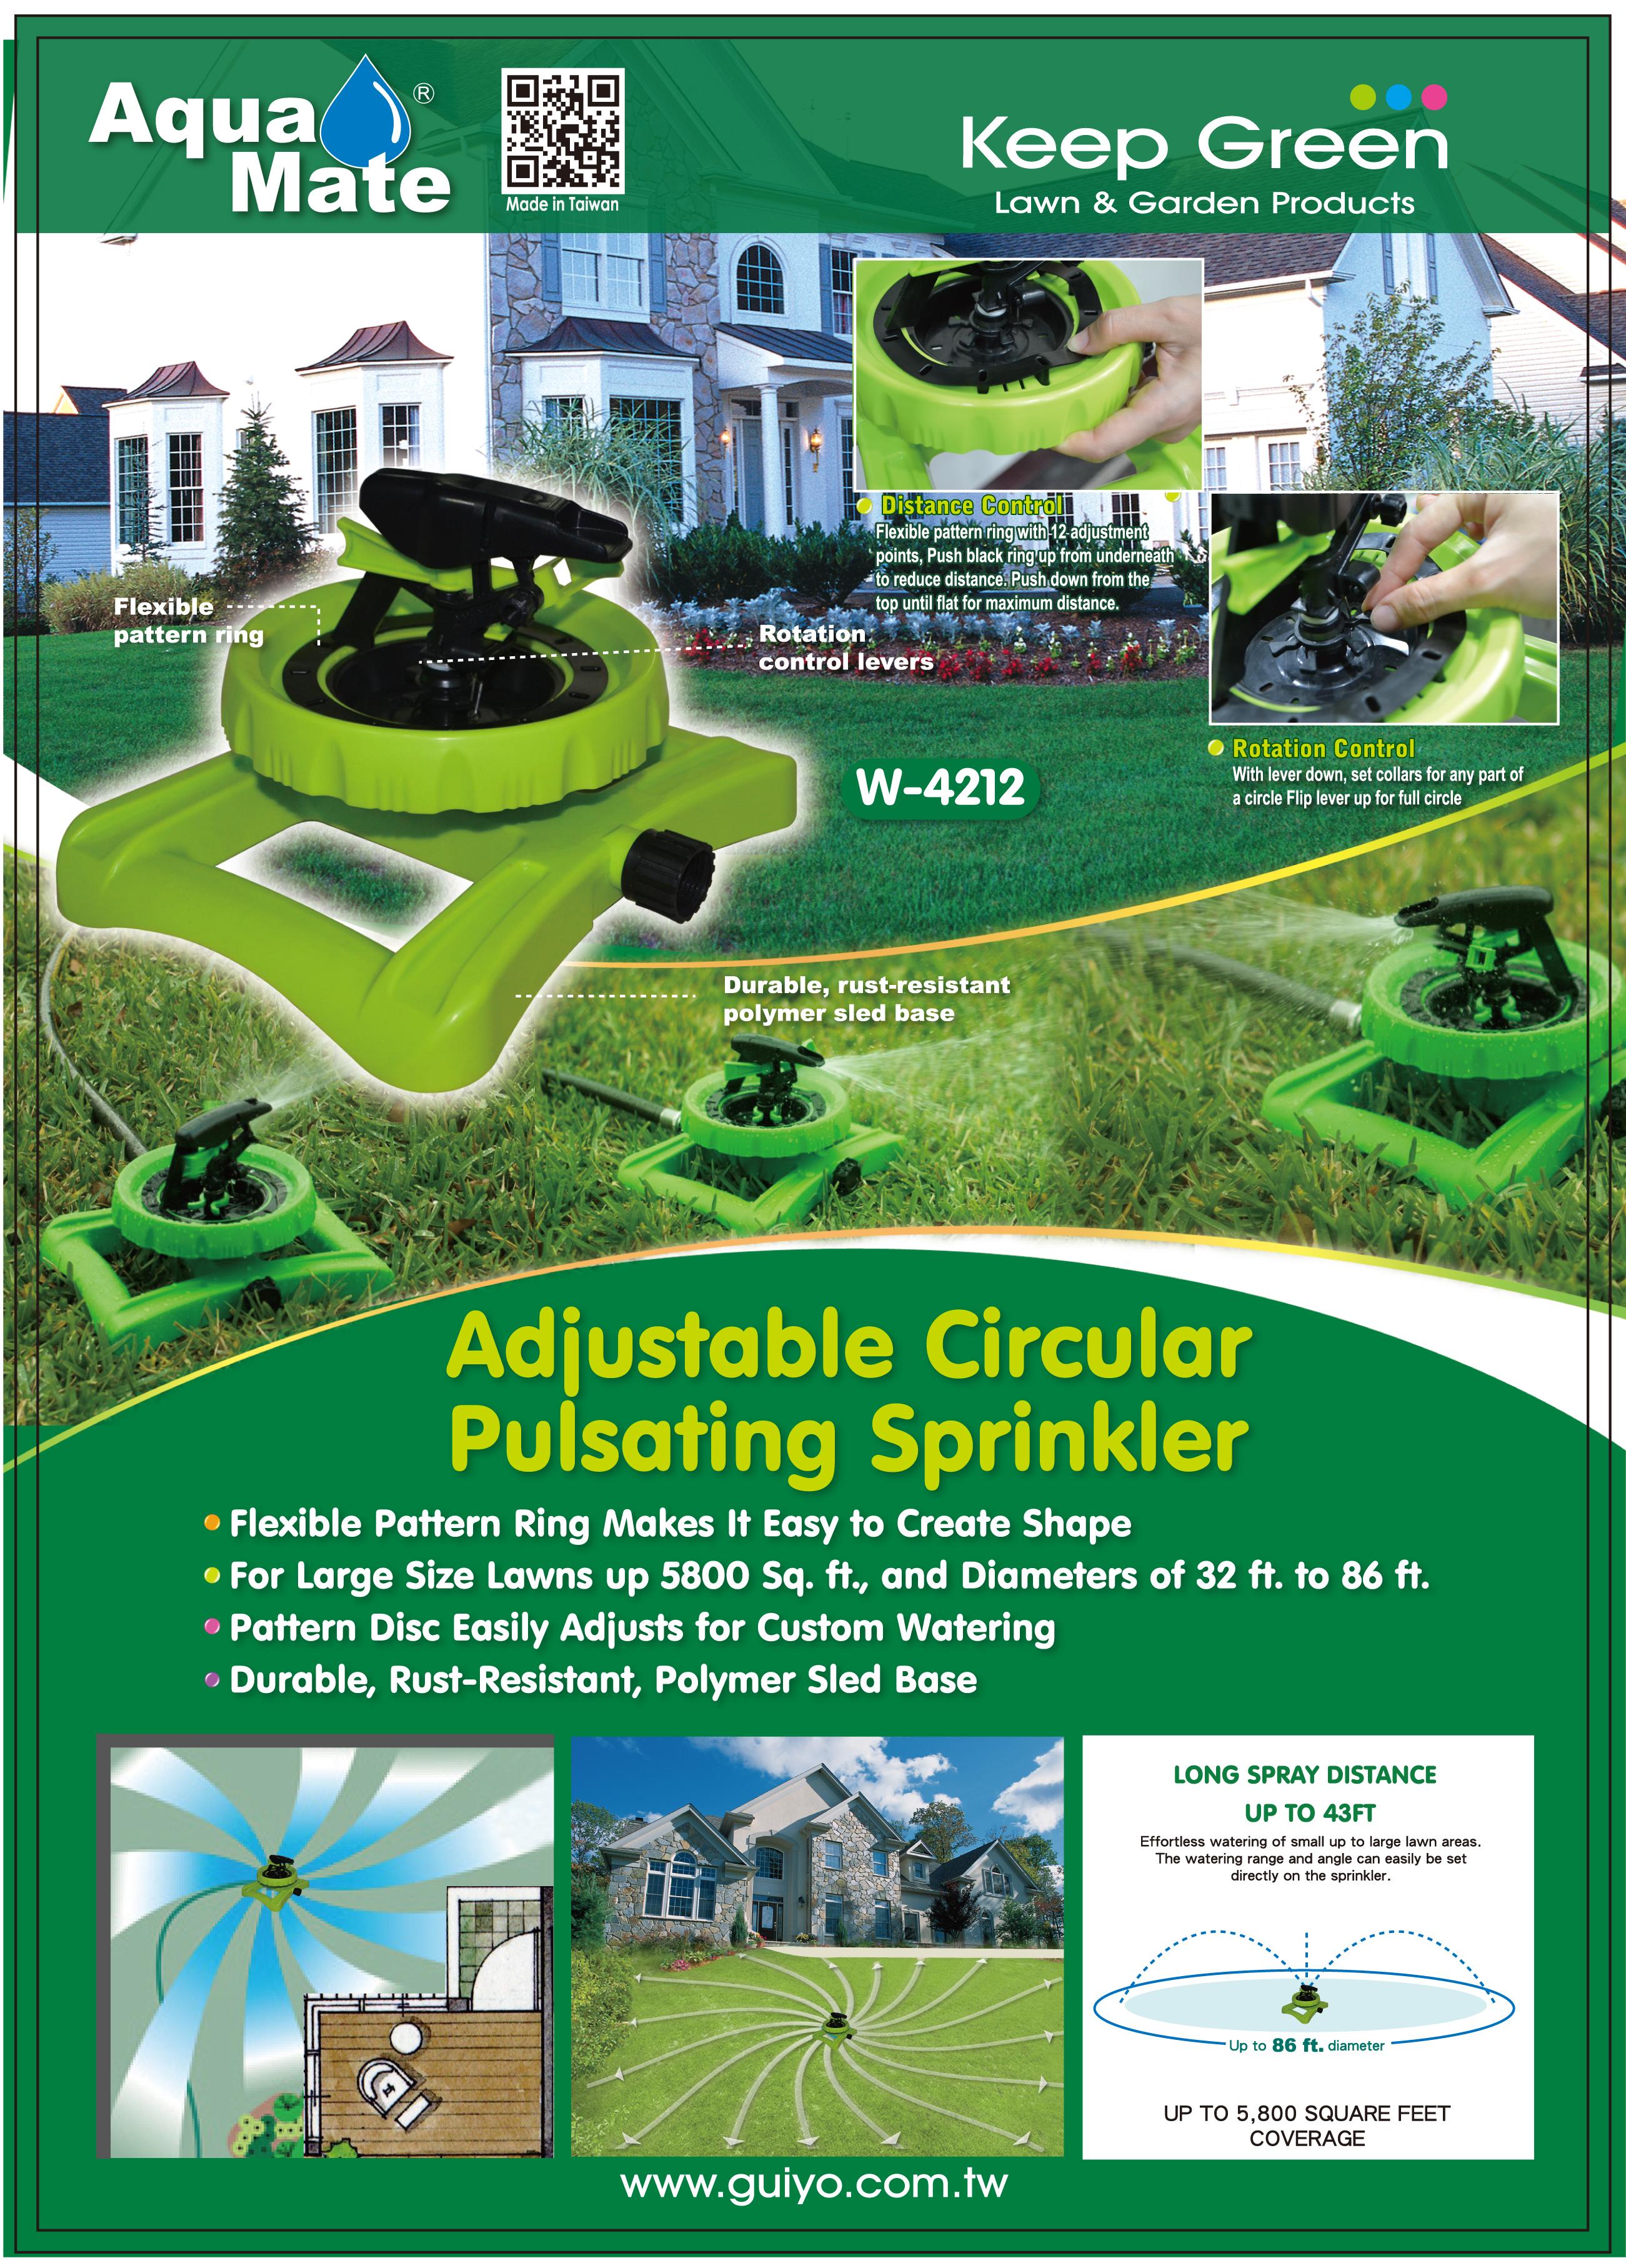 Adjustable Circular Pulsating Sprinkler